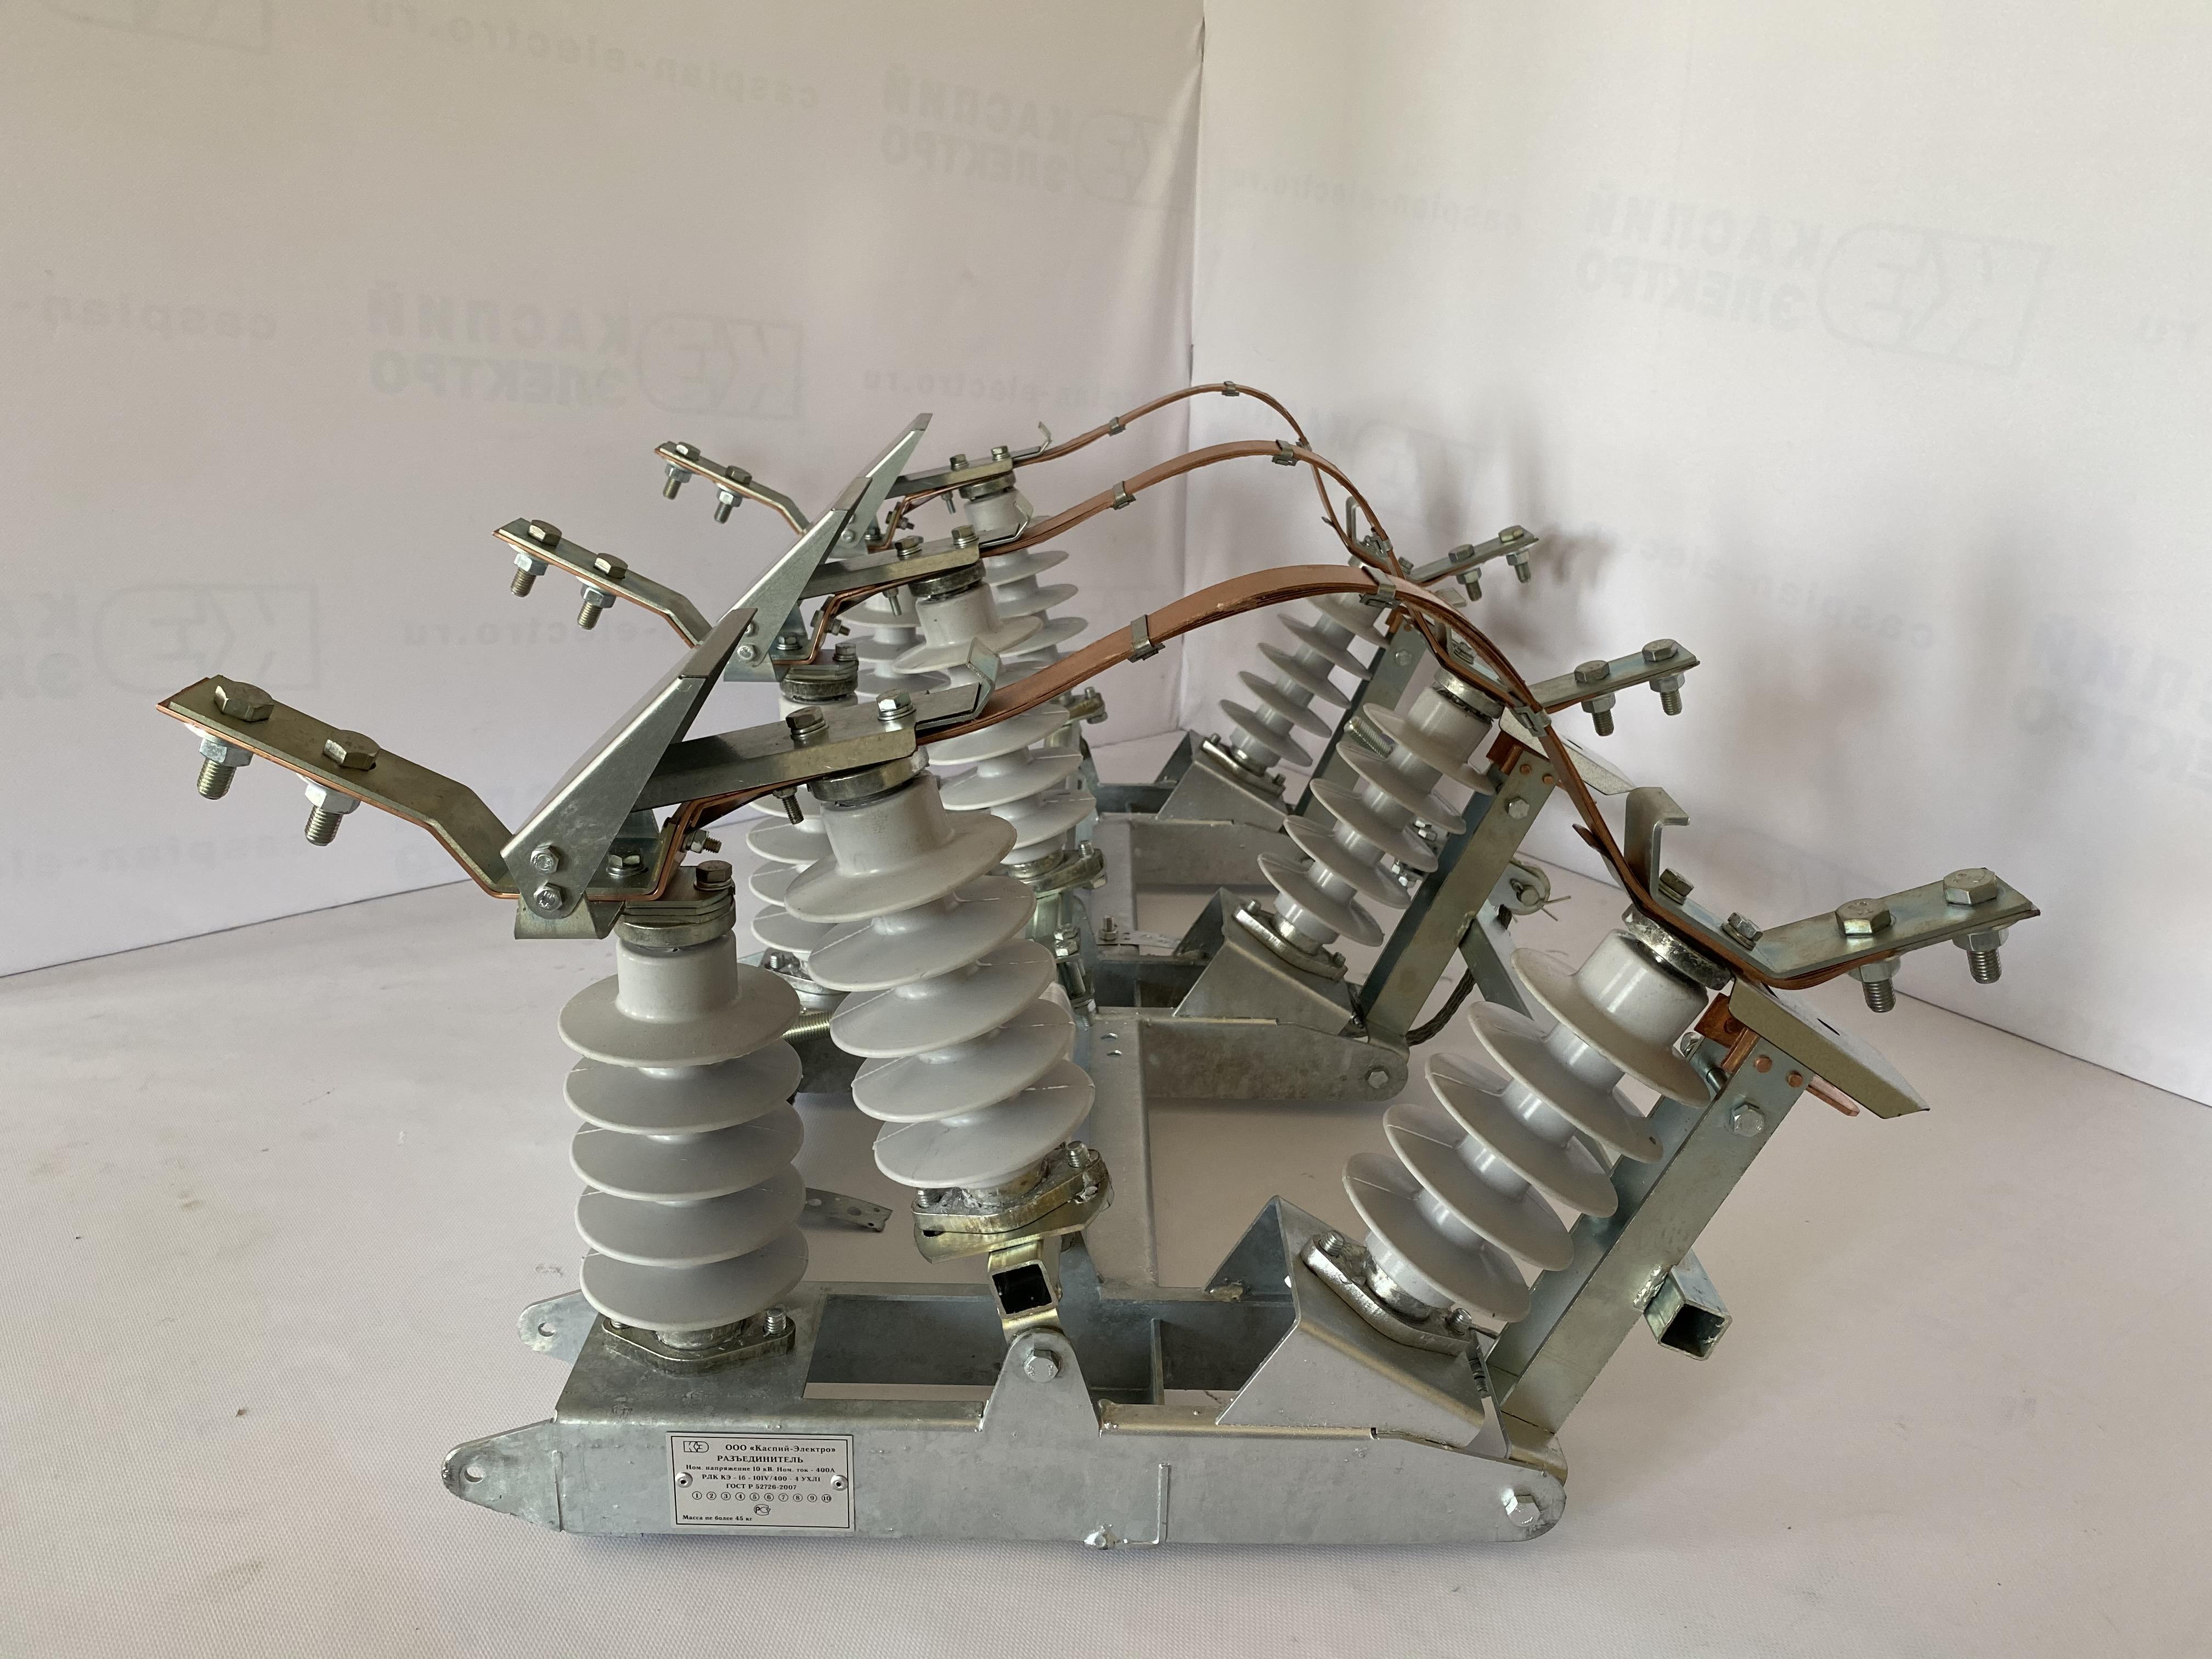 РЛК КЭ-1б-10 IV/400